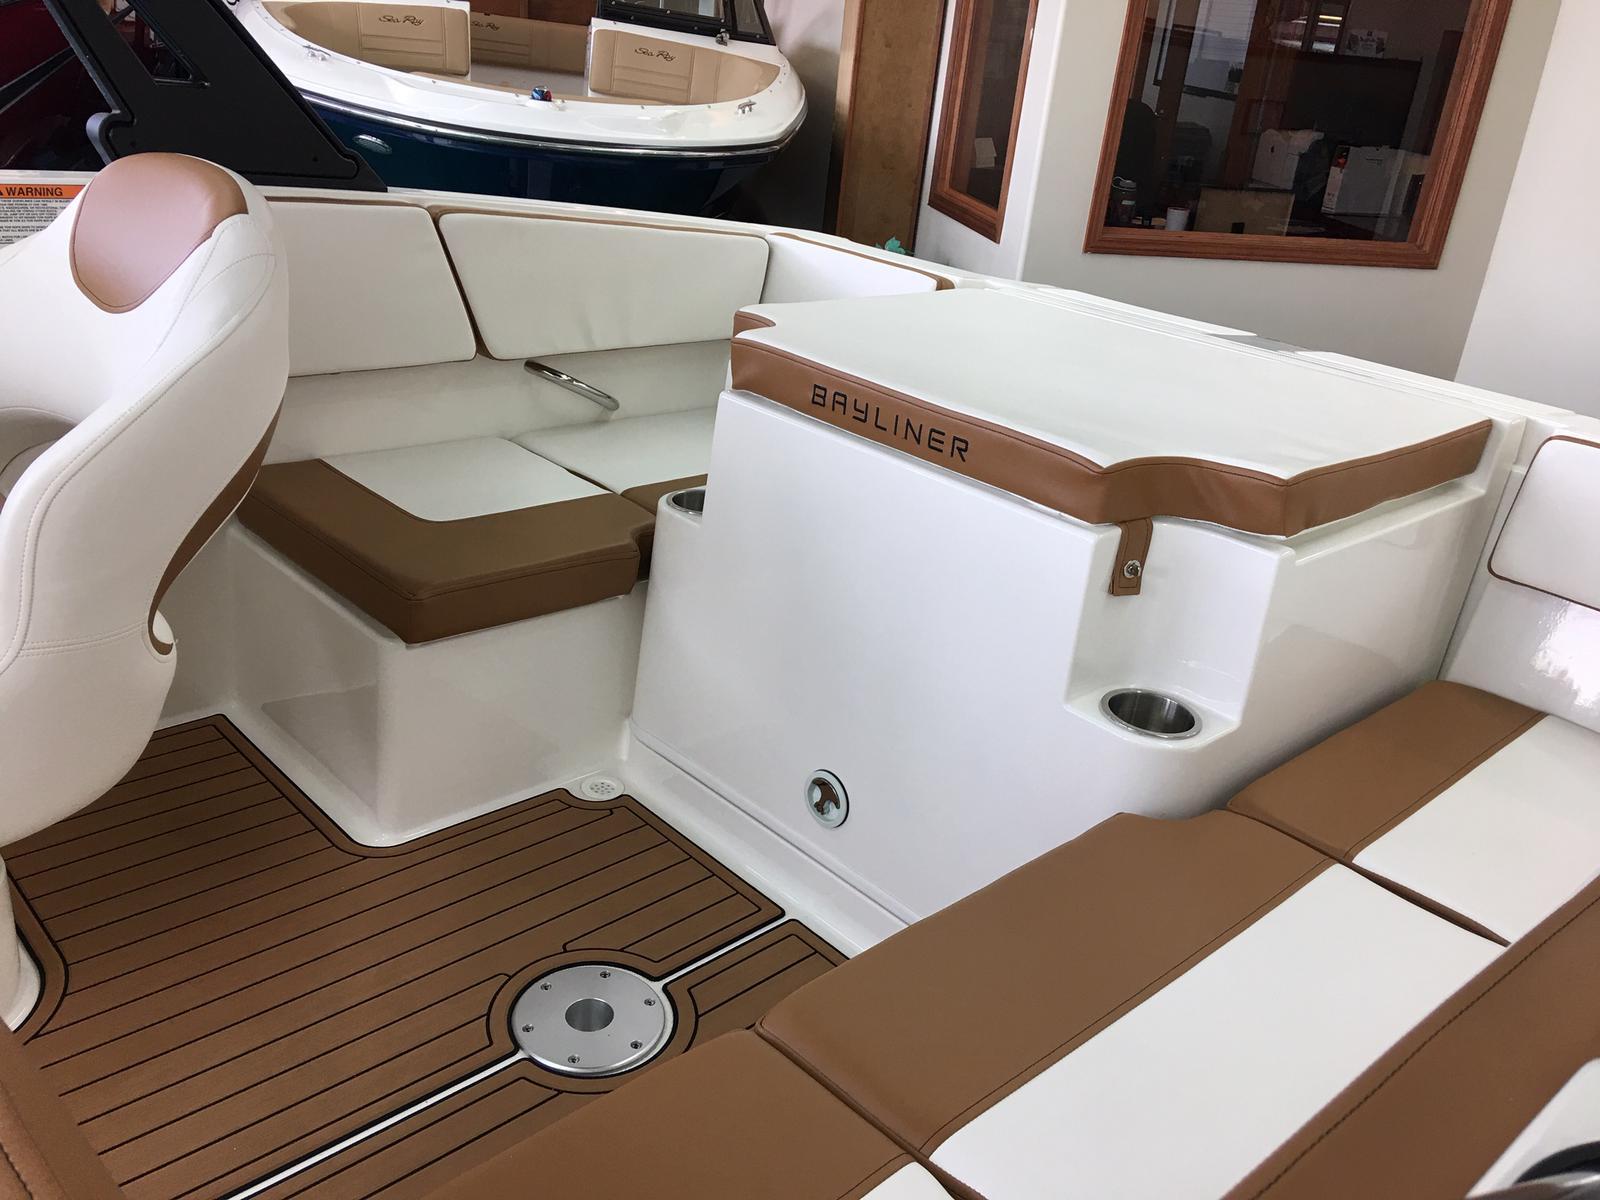 2019 Bayliner boat for sale, model of the boat is VR4 Bowrider & Image # 4 of 22